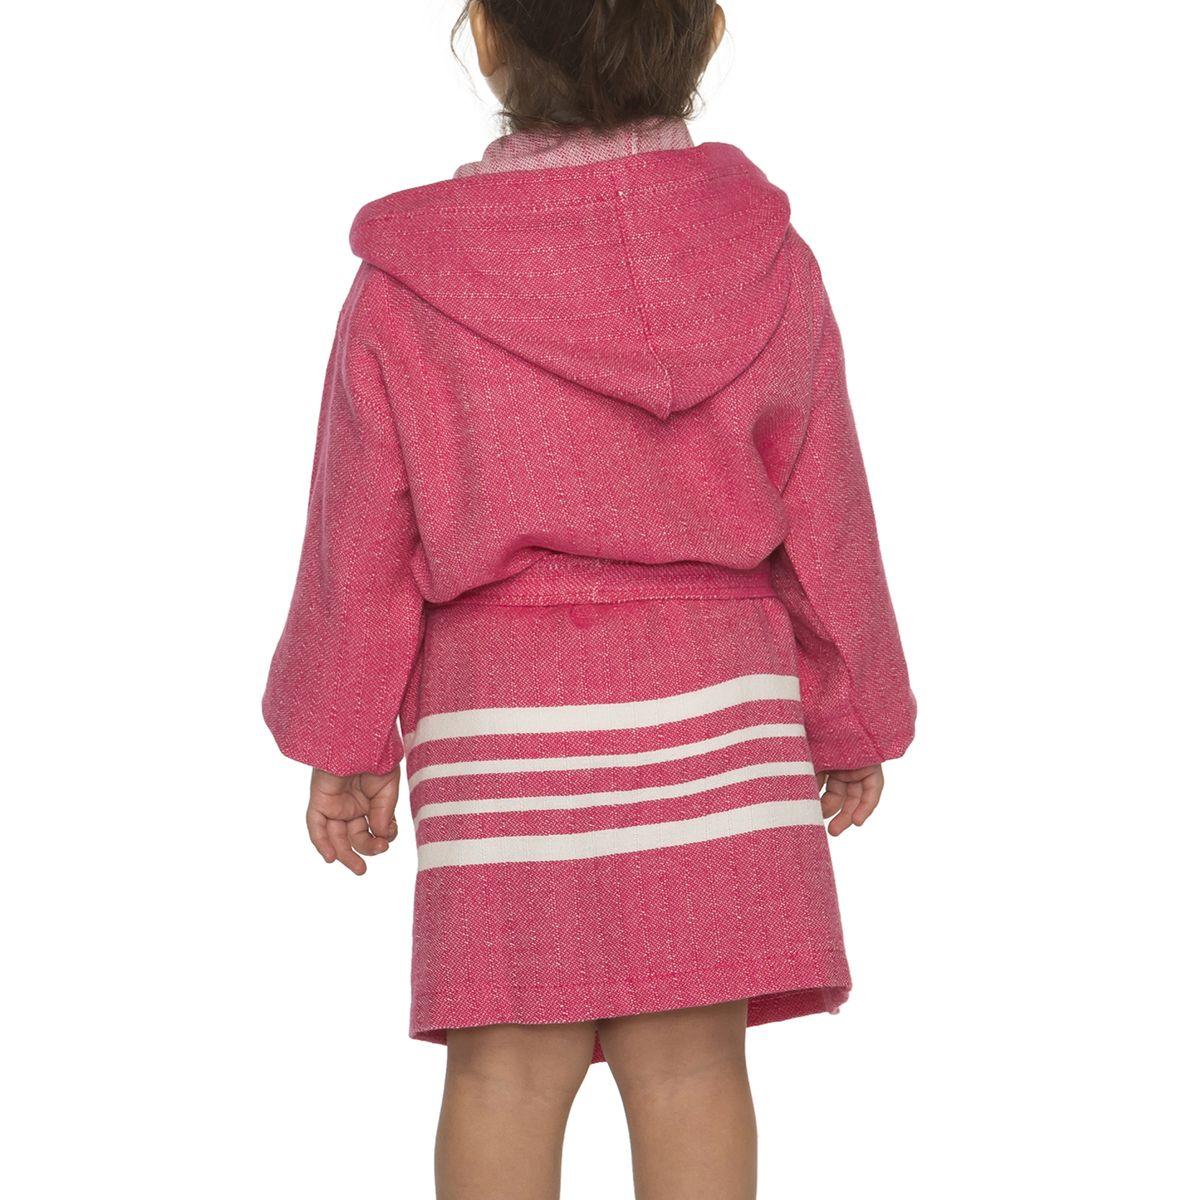 Bathrobe Kiddo with hood - Fuchsia